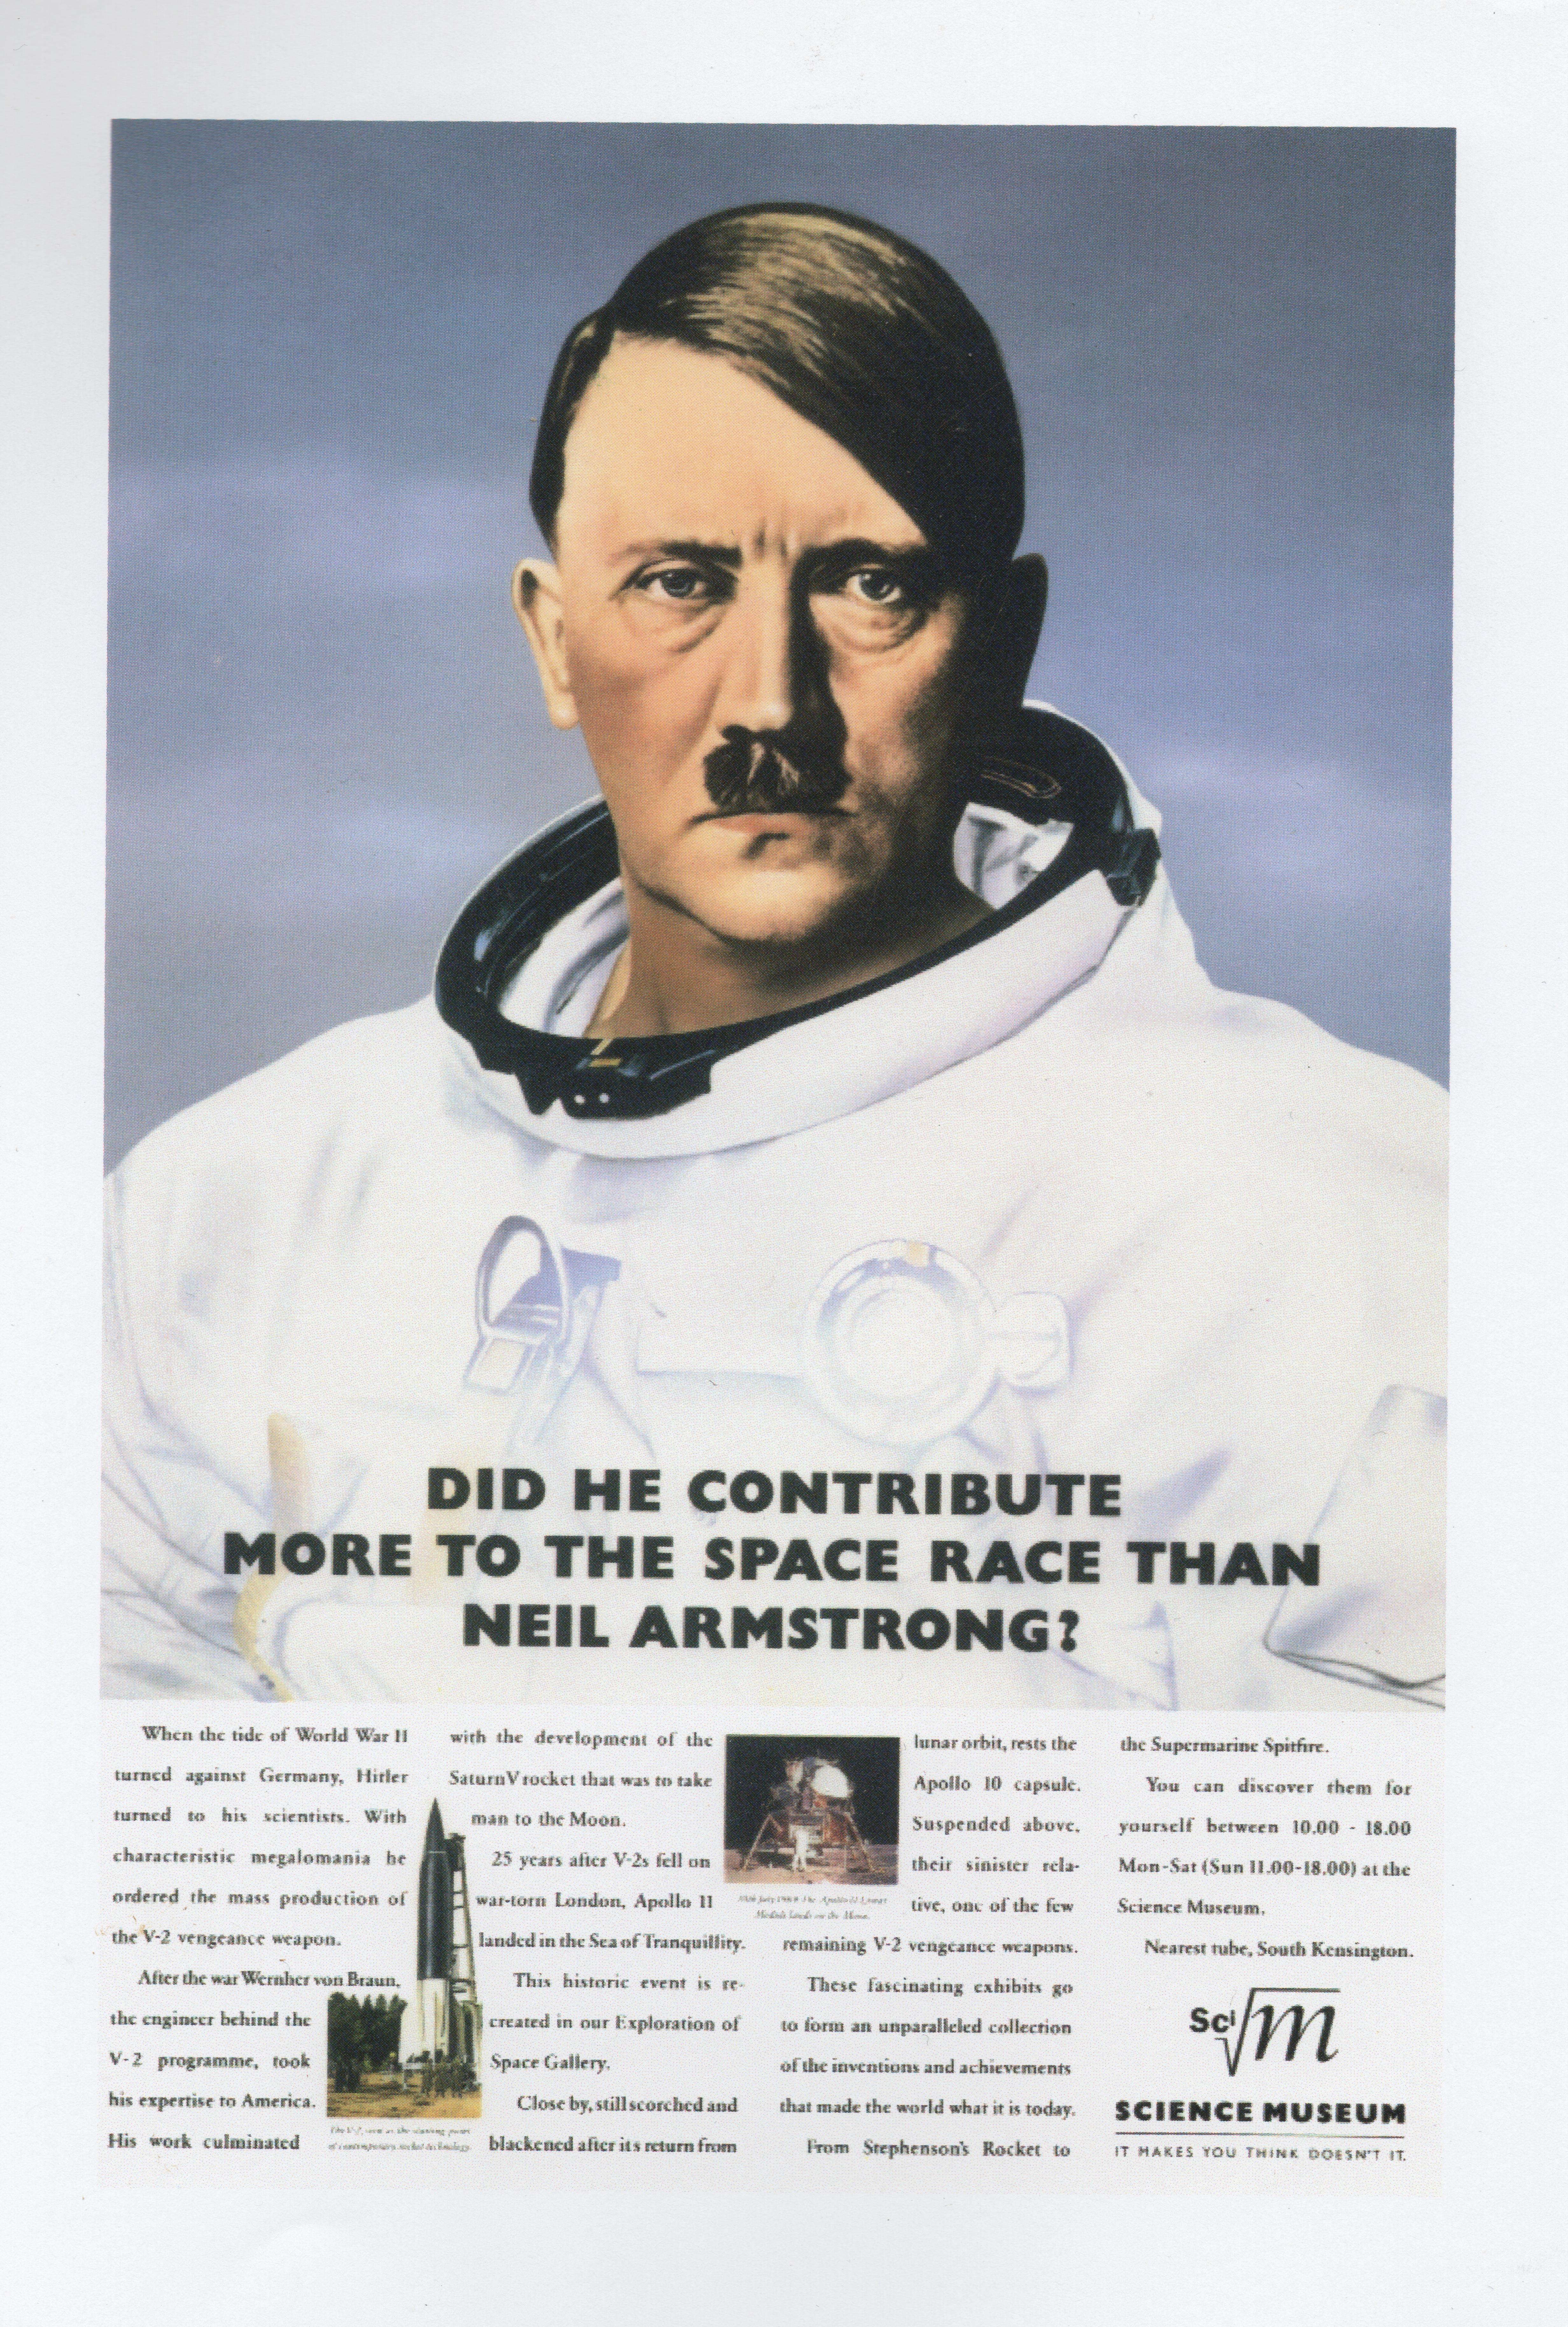 SCIENCE_MUSEUM_Hitler